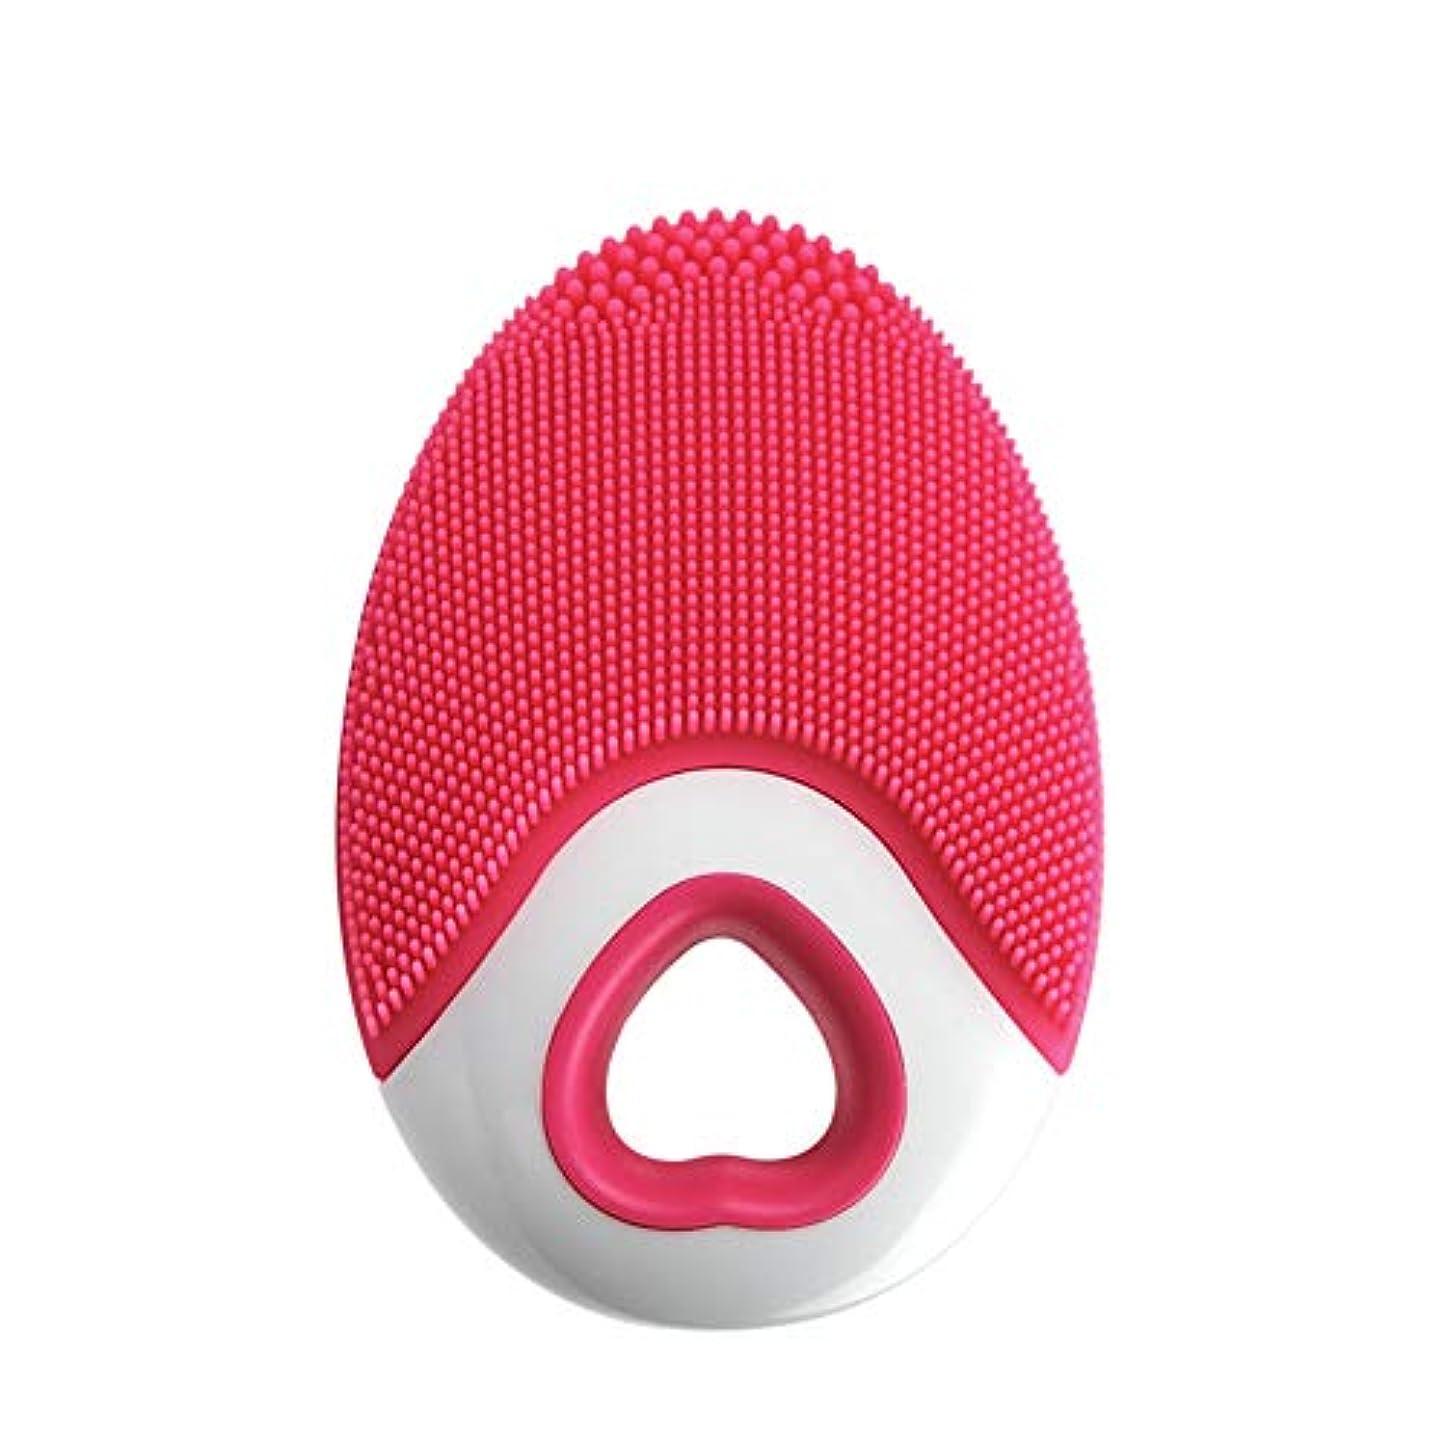 Aylincool   1ピースシリコンフェイスクレンザーブラシ超音波ディープクリーニング防水ワイヤレス充電